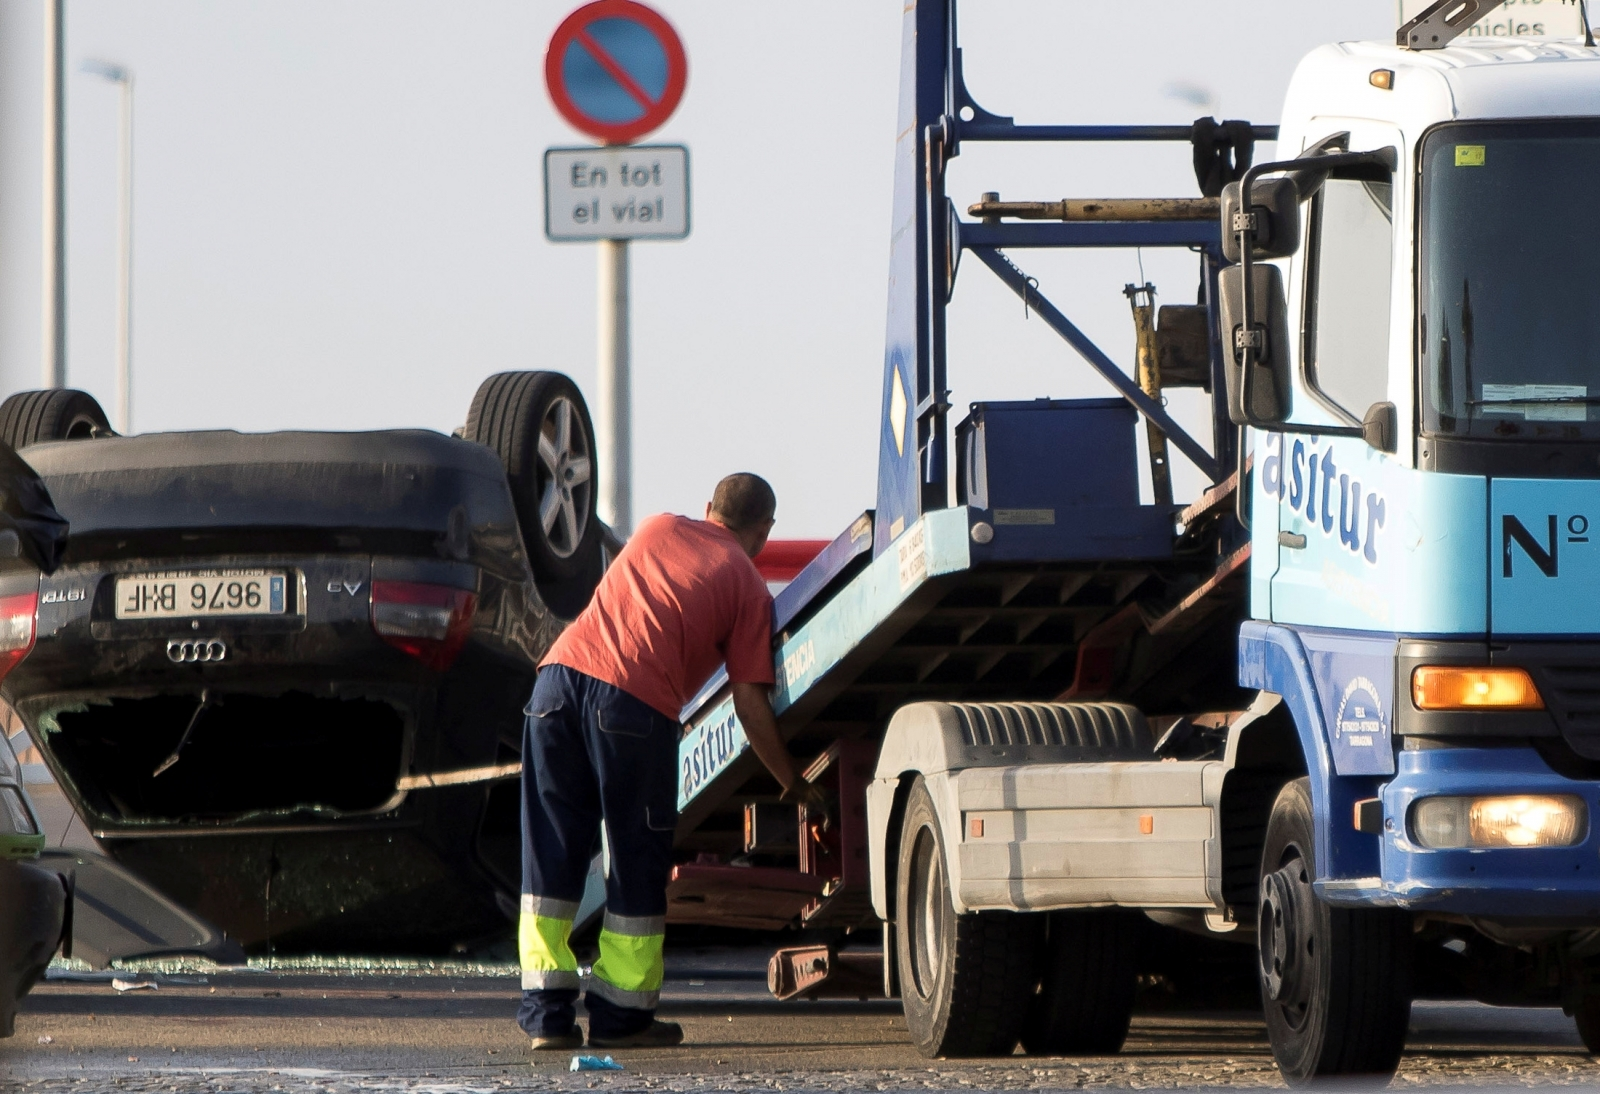 Cambrils Barcelona Spain Terror Attack